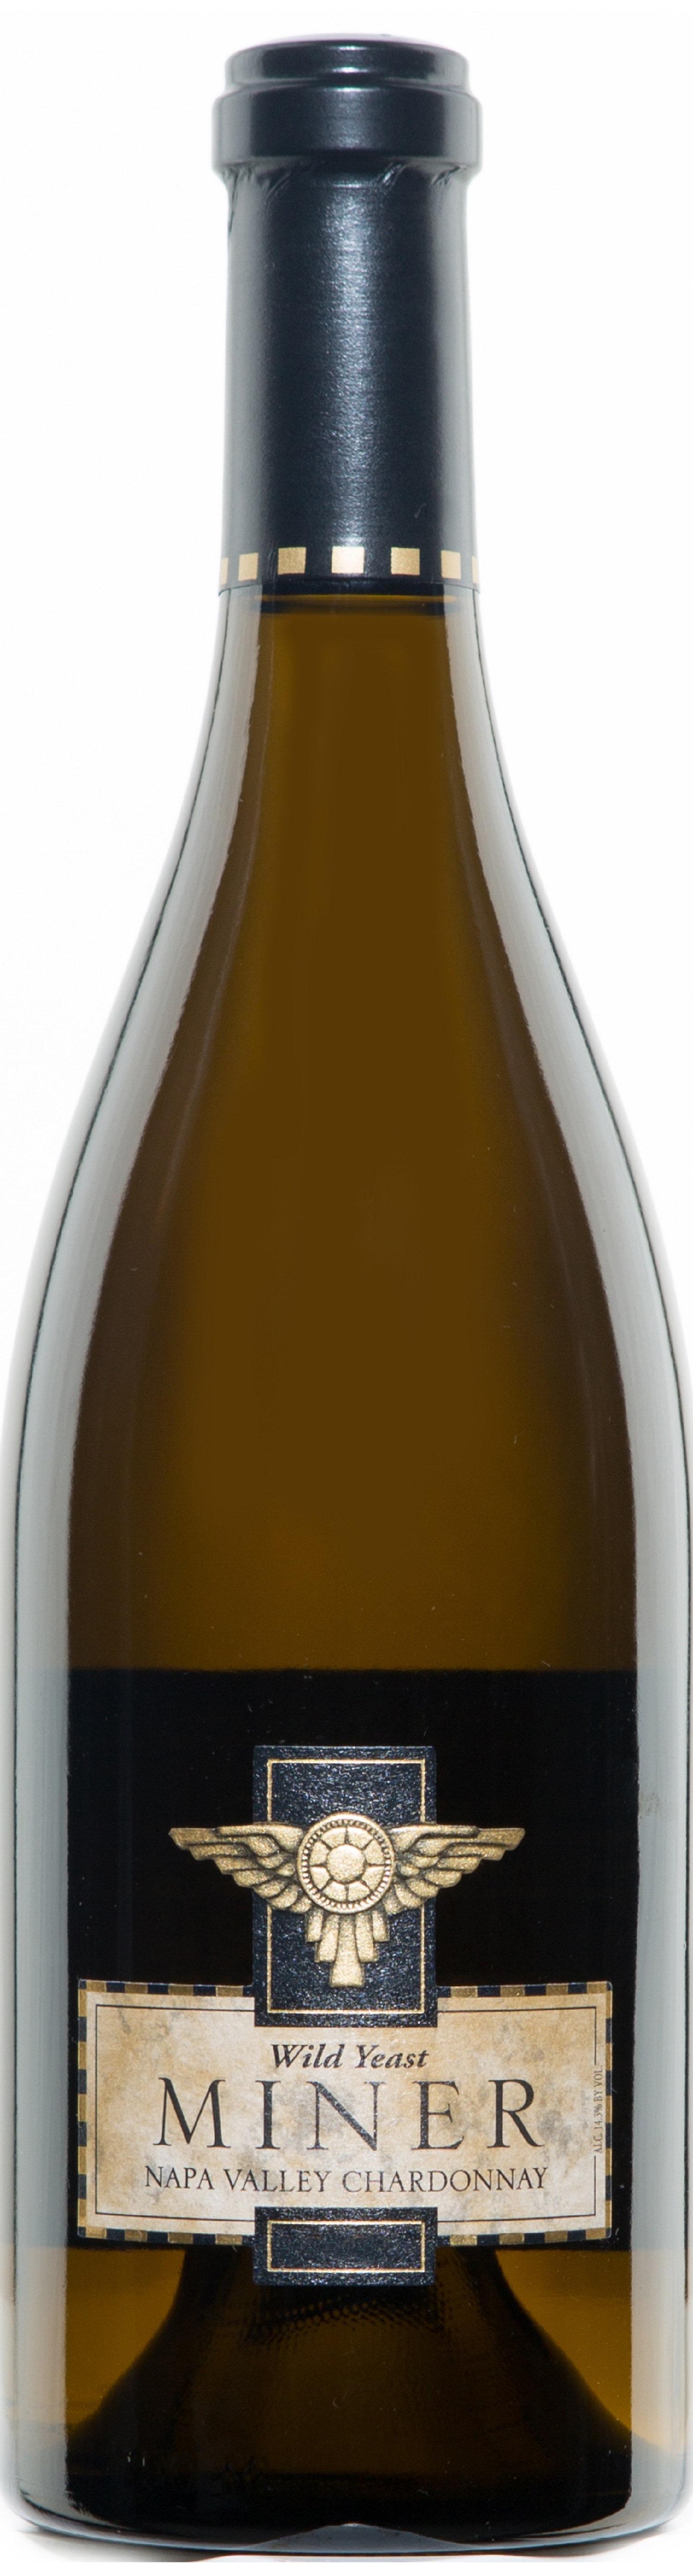 Miner - Wild Yeast Chardonnay, Napa